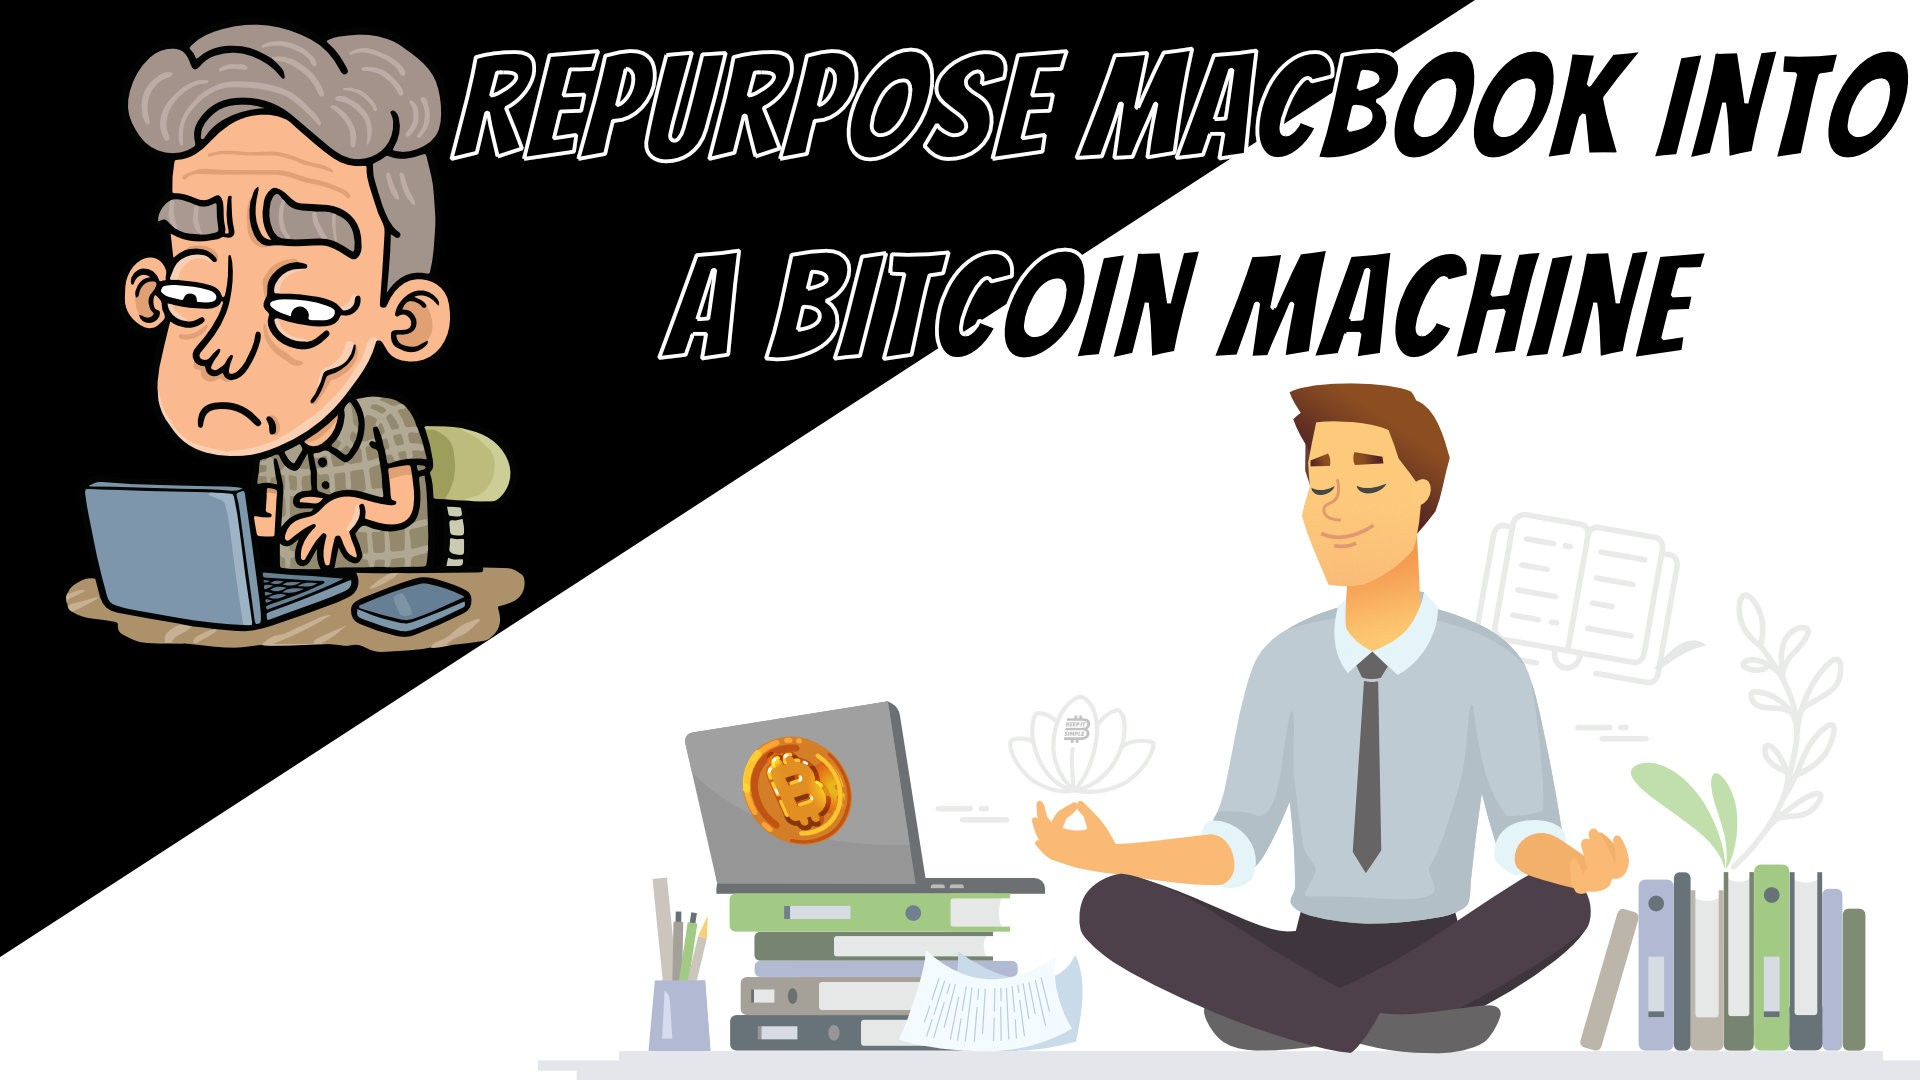 Macbook Bitcoin Machine